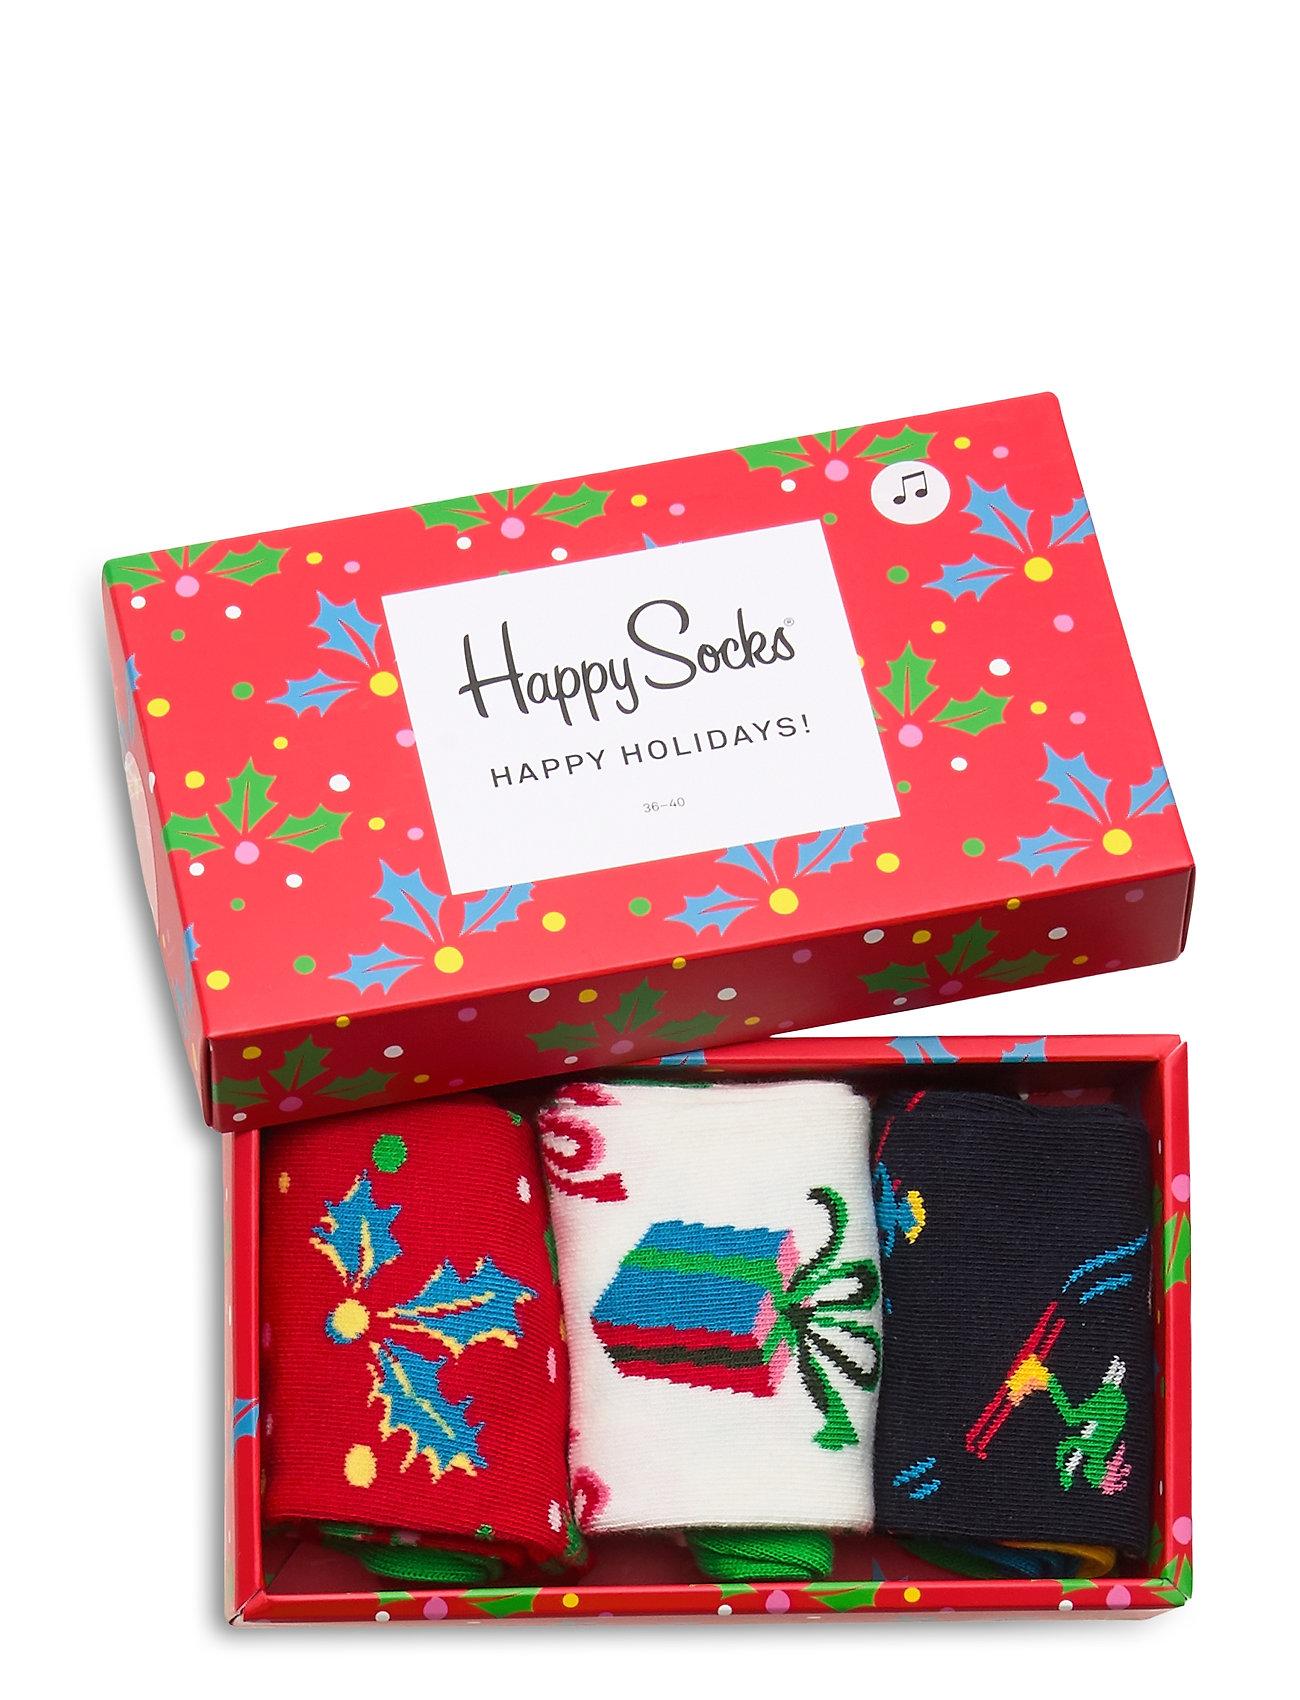 Happy Socks Playing Holiday Gift Box - Strømper MULTI - Menn Klær